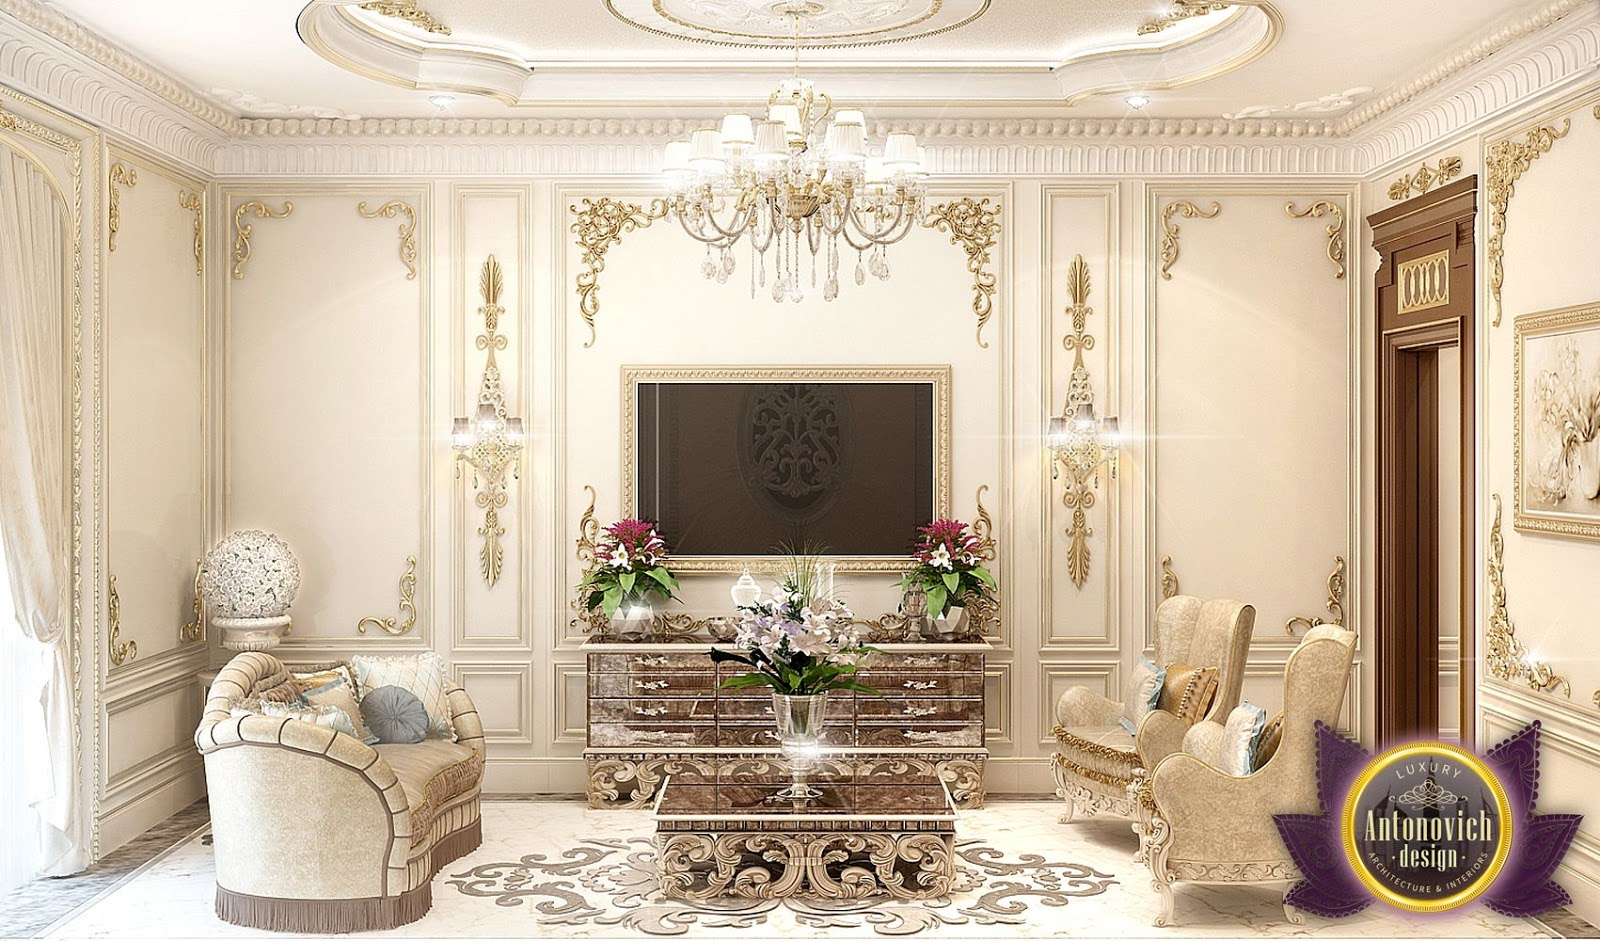 LUXURY ANTONOVICH DESIGN UAE Luxury Royal Arabic